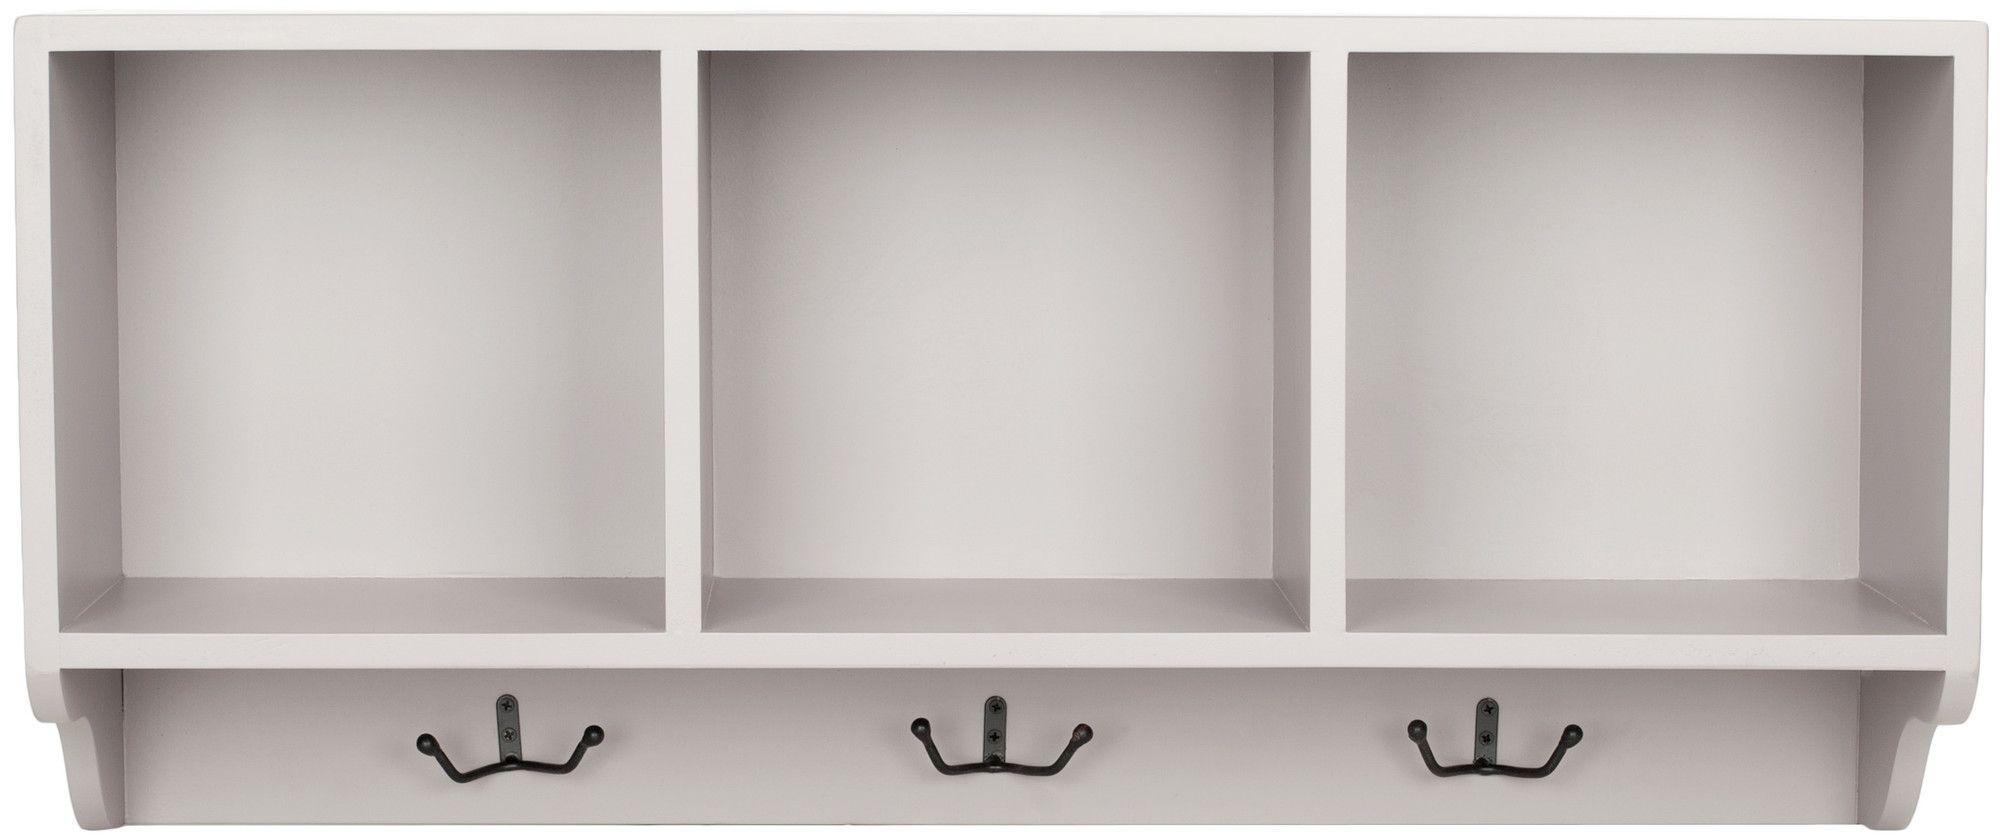 Wall Shelf & 3 Hook Wall Coat Rack